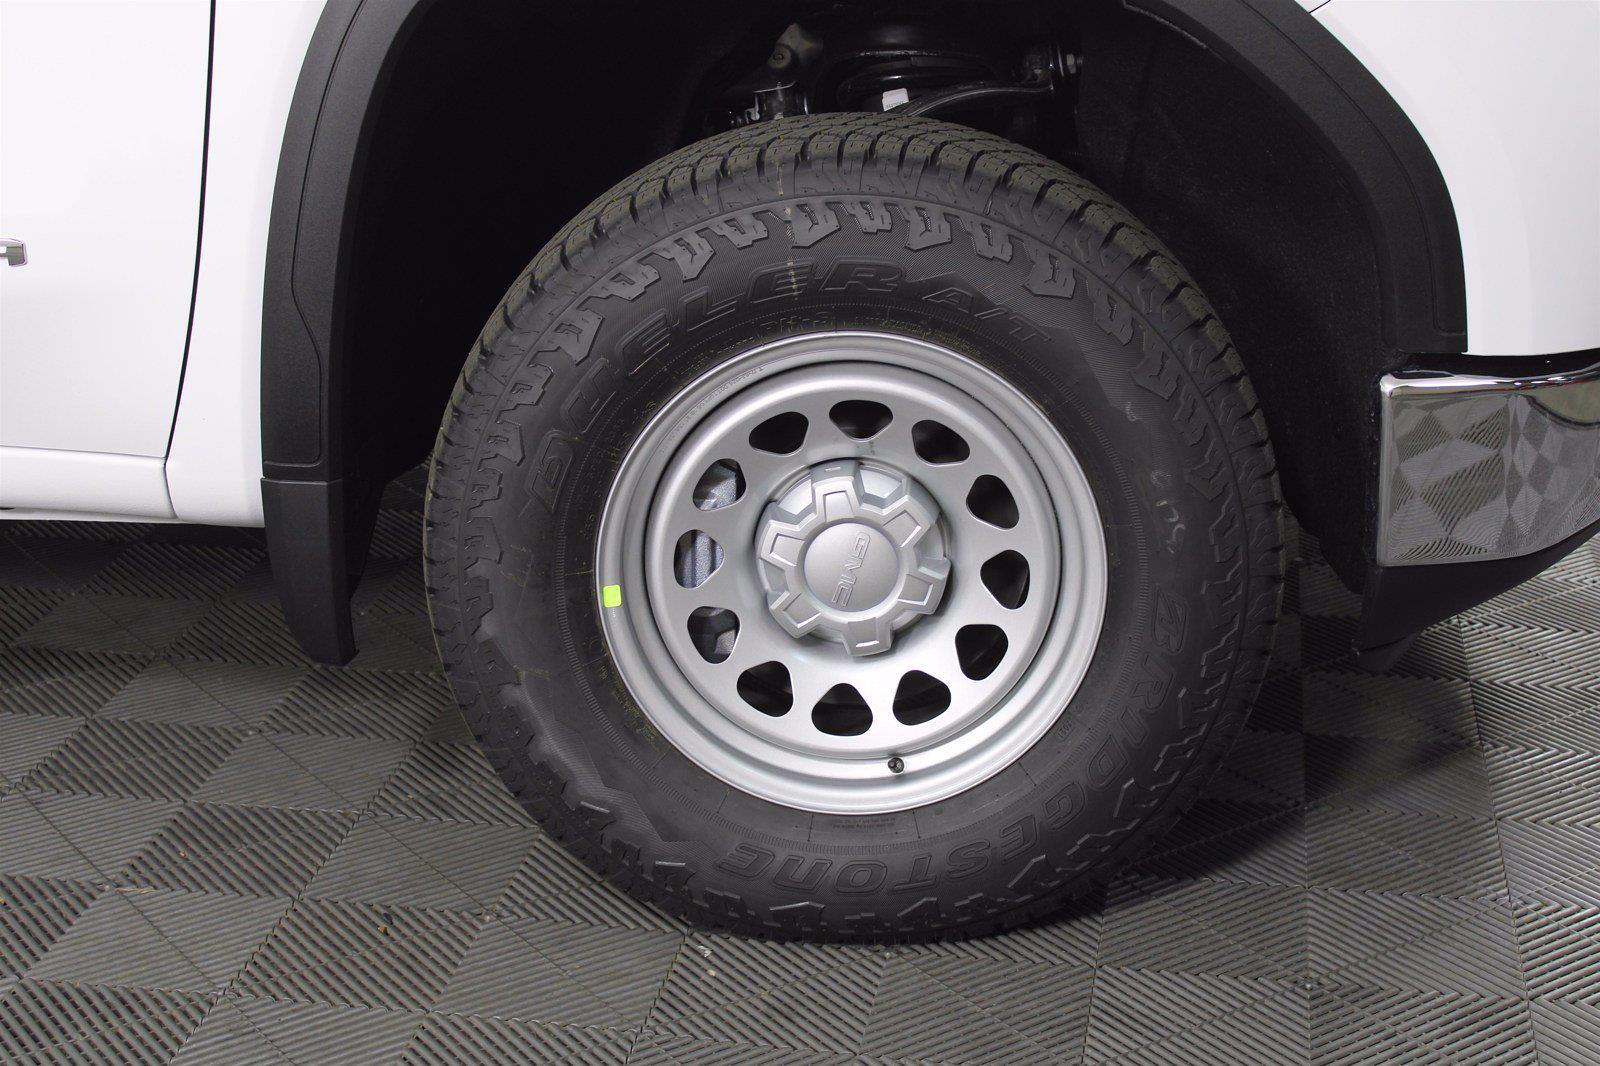 2021 GMC Sierra 1500 Regular Cab 4x4, Pickup #D411083 - photo 5